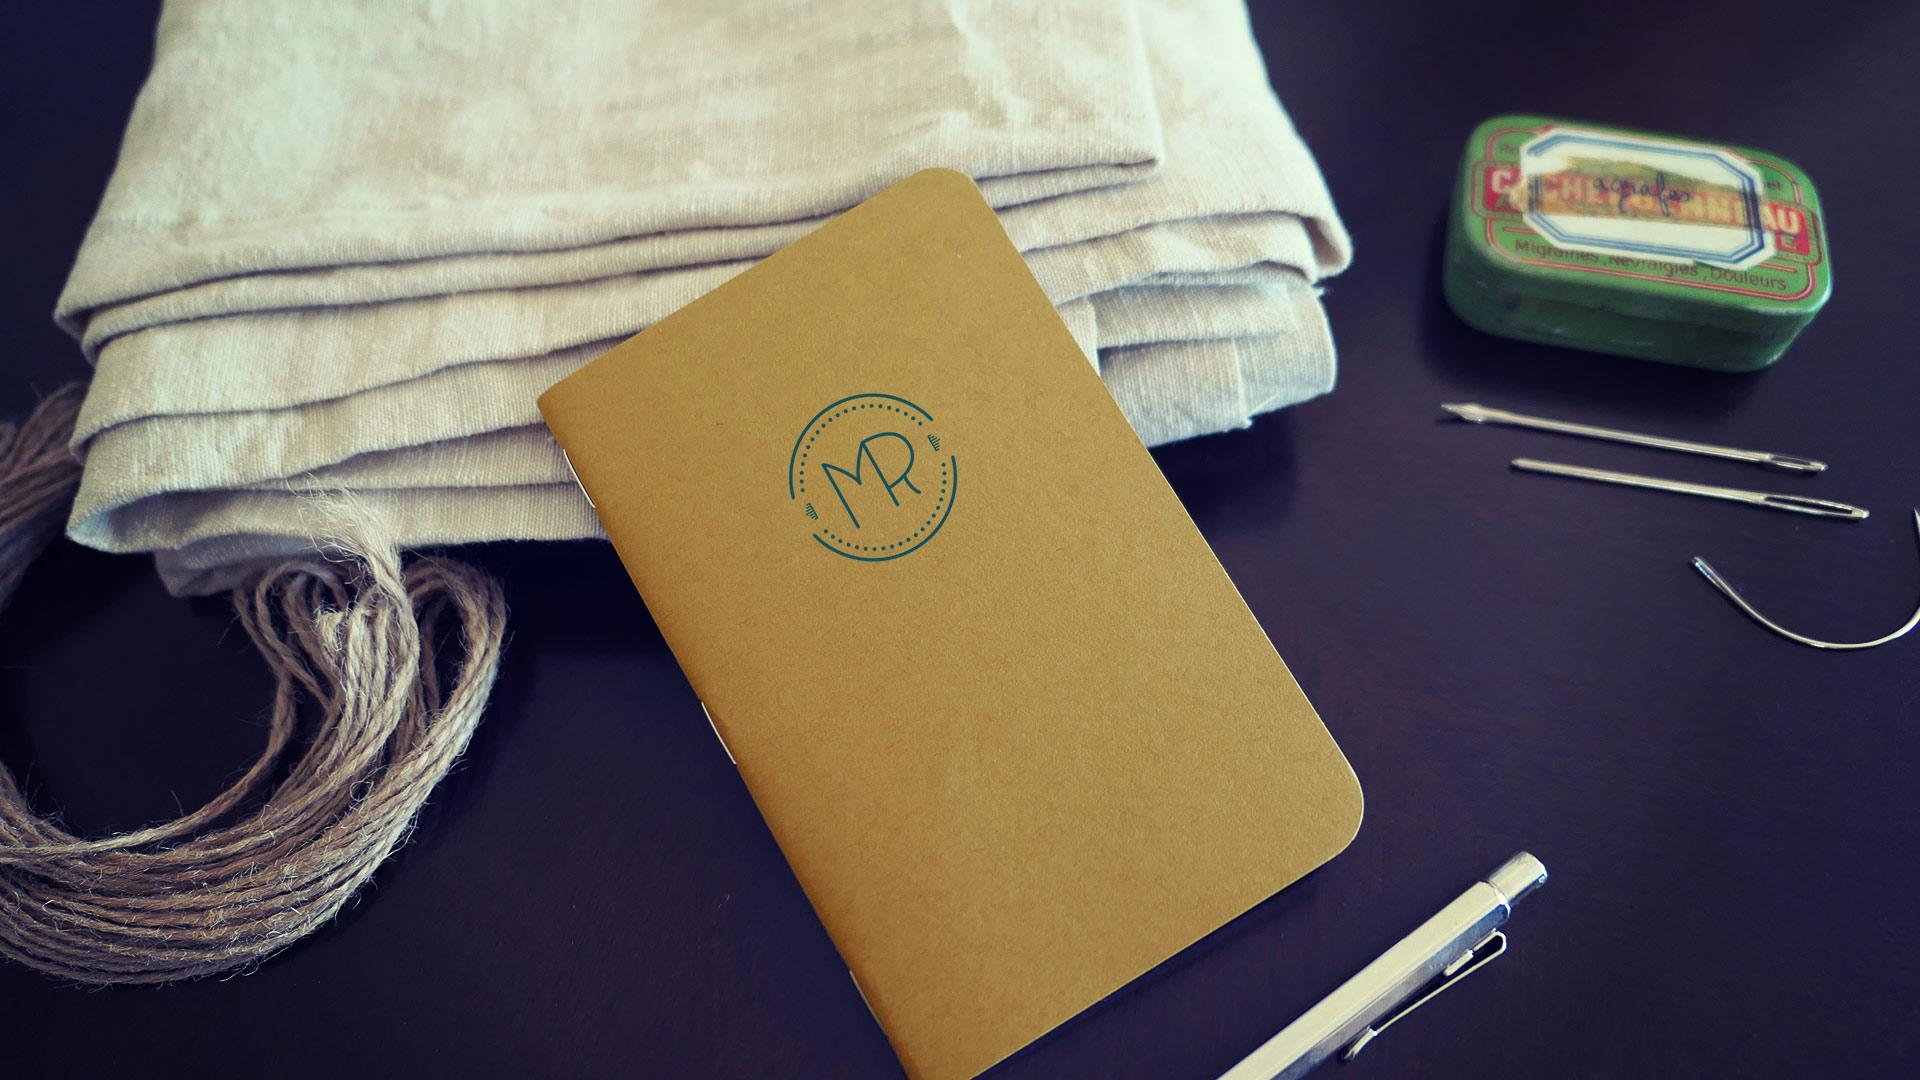 Branding Project Logo Design Business Card || Atelier MR